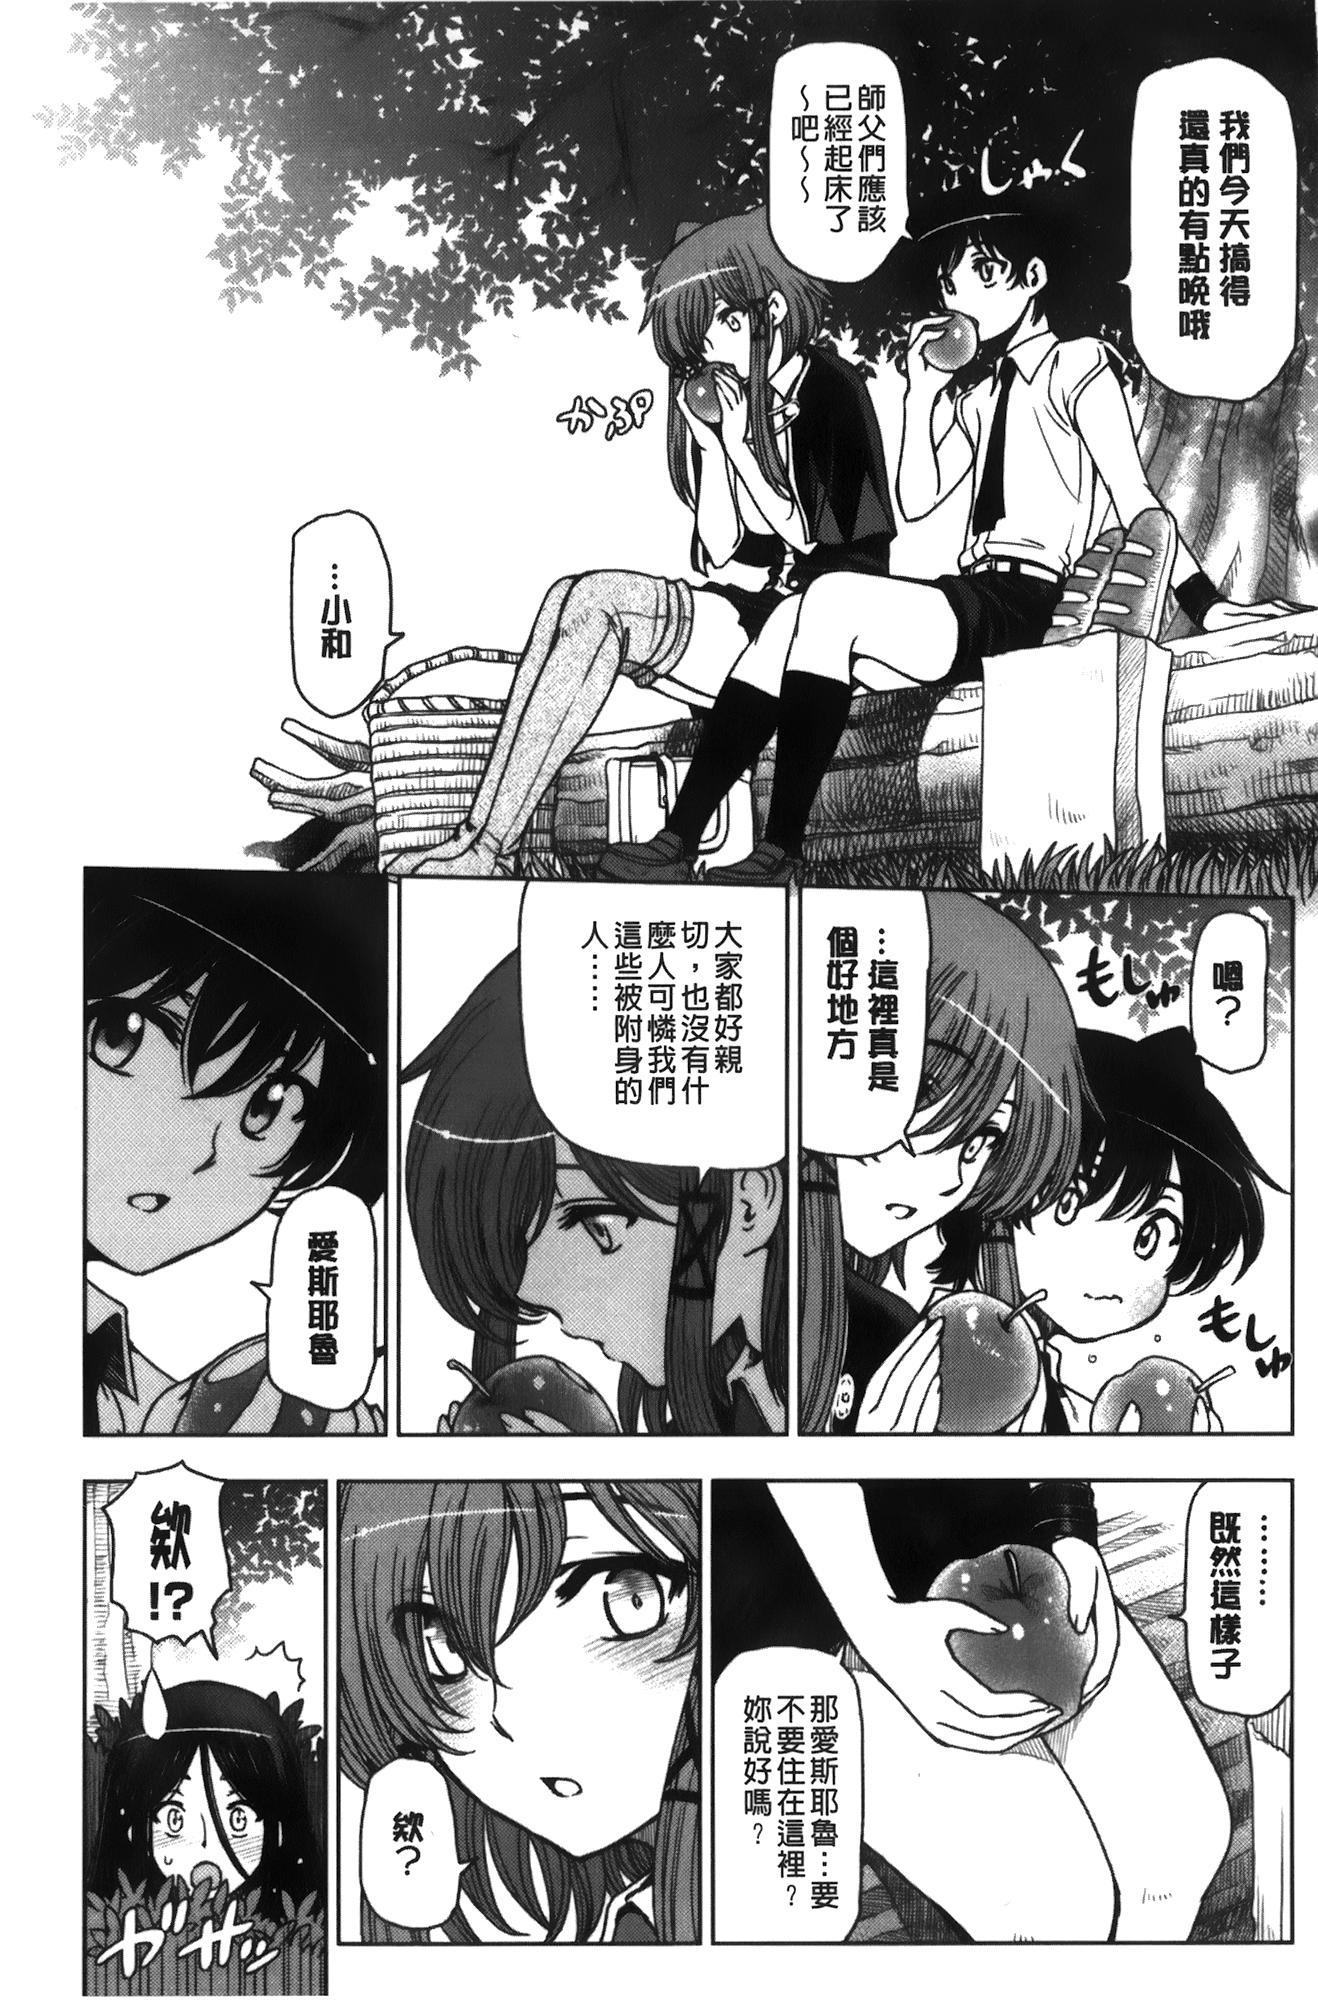 Majo × Shota ~ Genteiban | 魔女X小正太 限定版 180